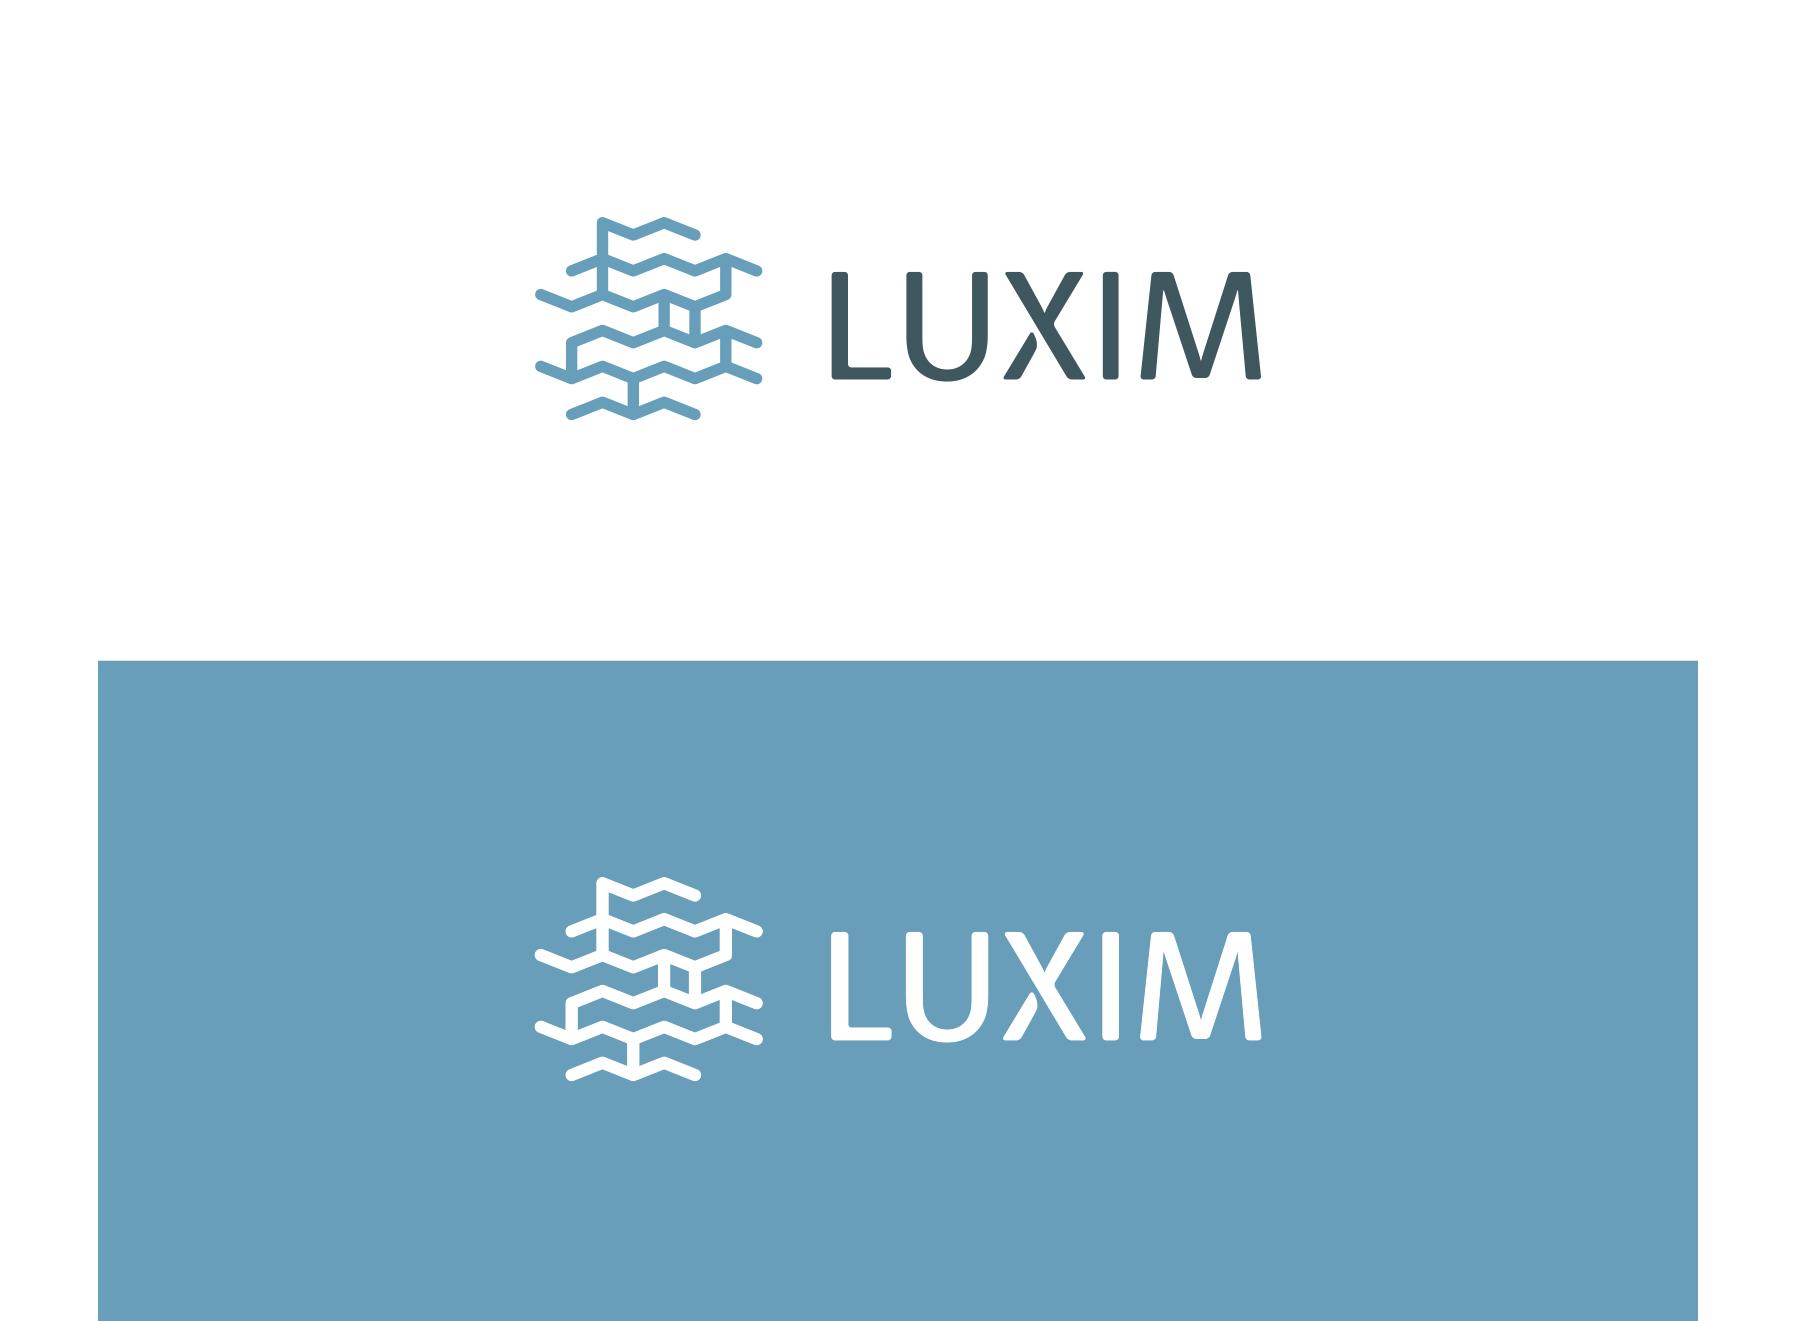 Luxim_02.jpg